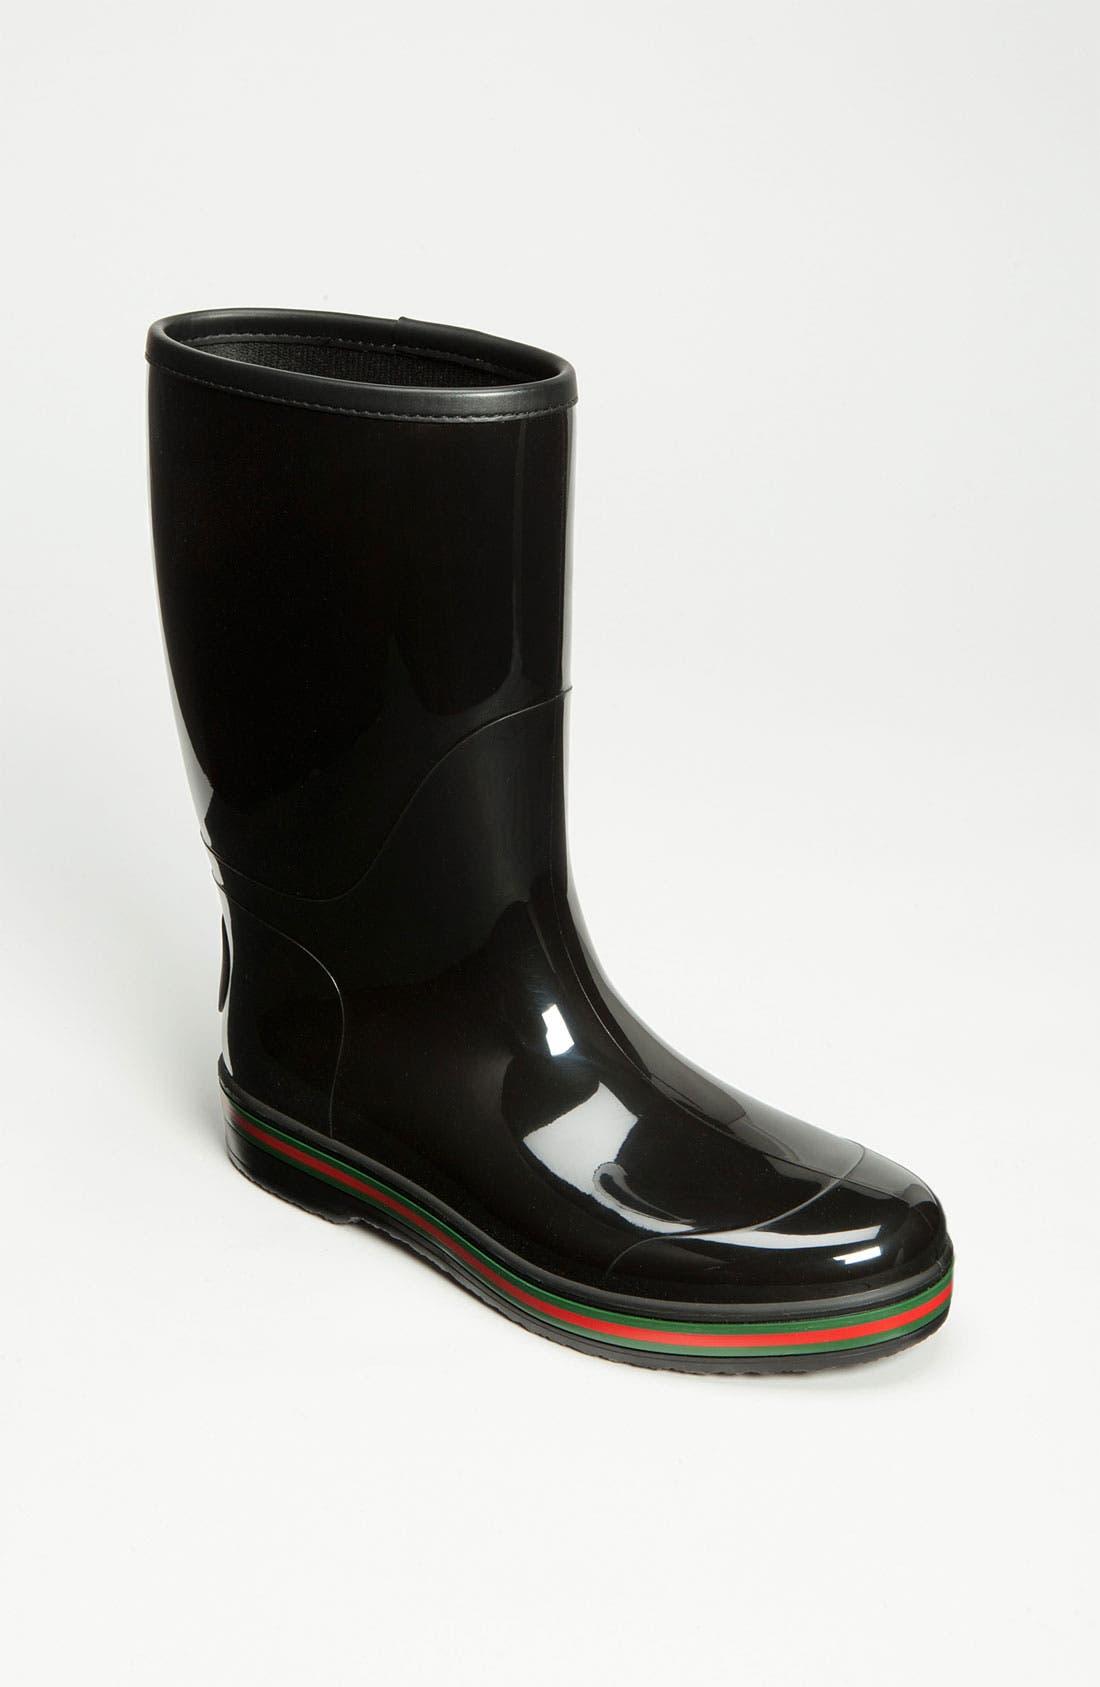 Alternate Image 1 Selected - Gucci 'Brest' Rain Boot